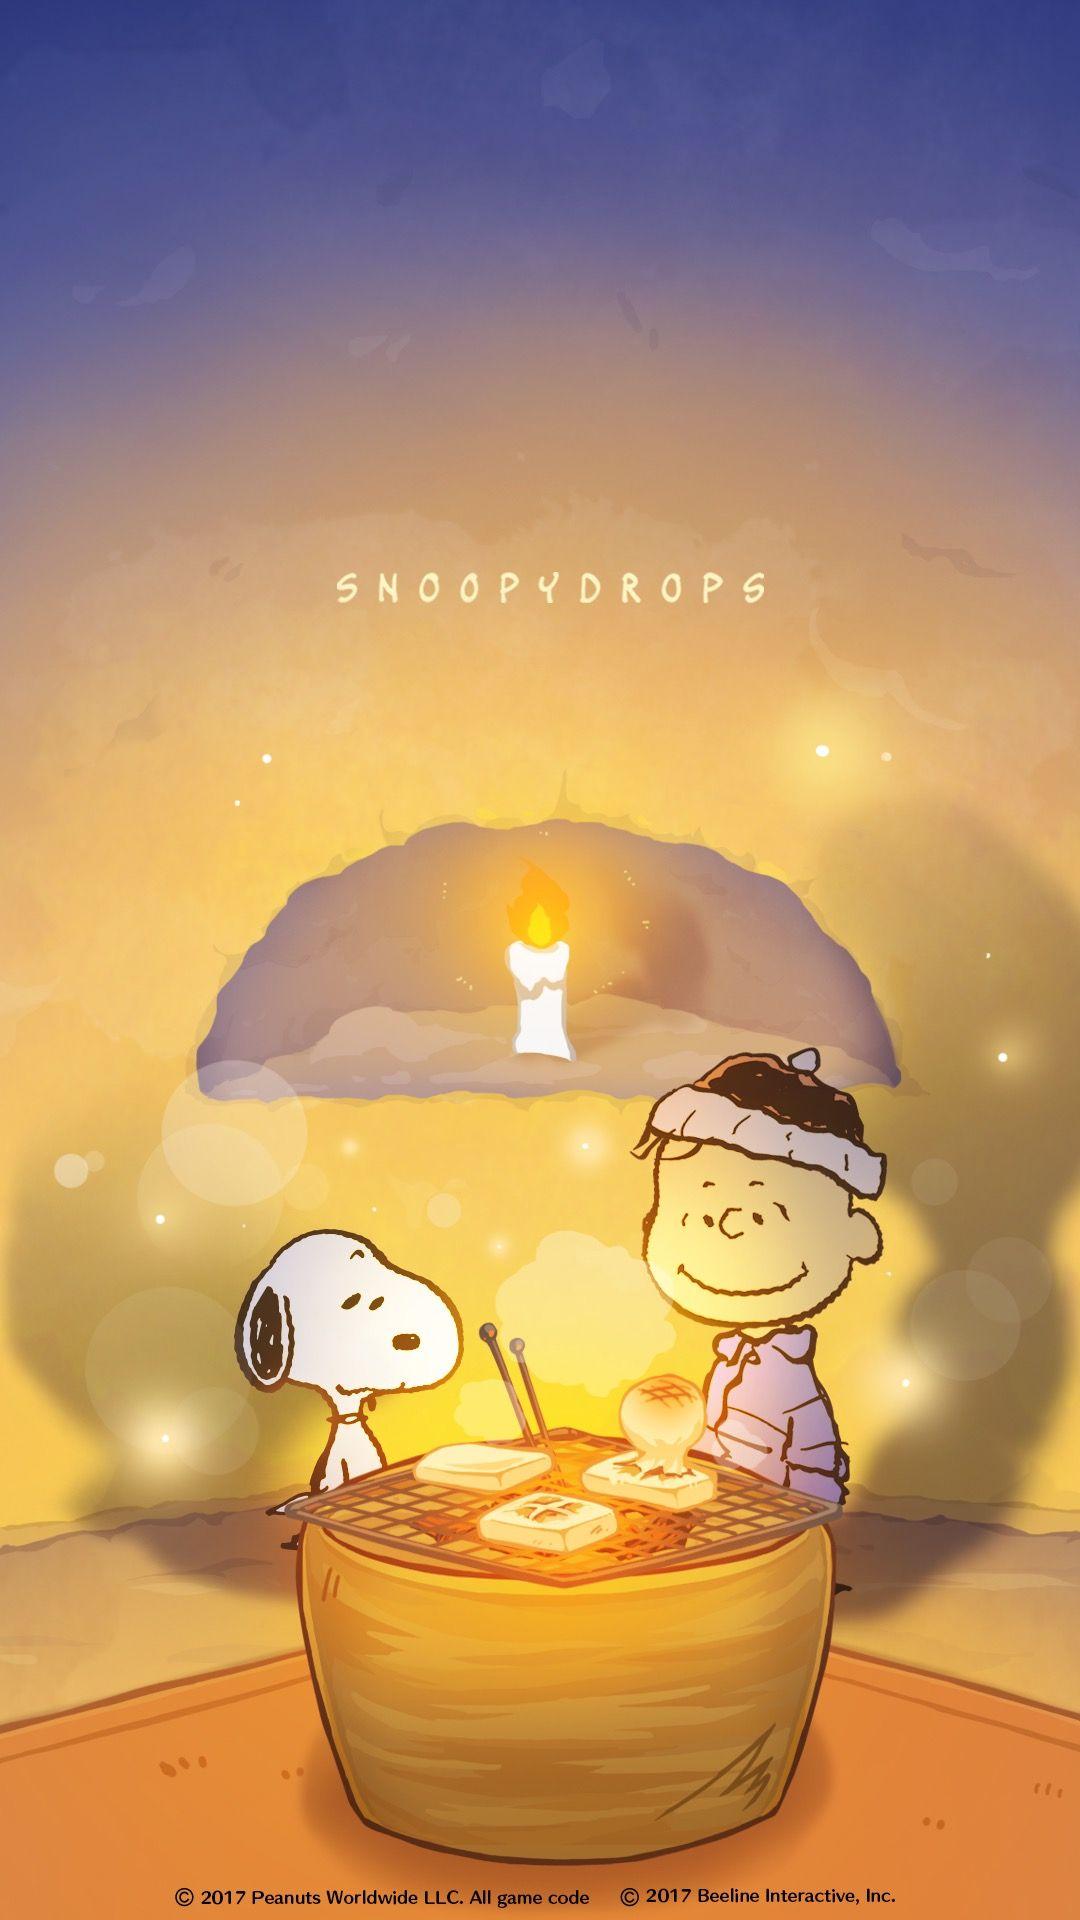 Snoopy スヌーピー 壁紙 かまくら スヌーピーの壁紙 スヌーピー